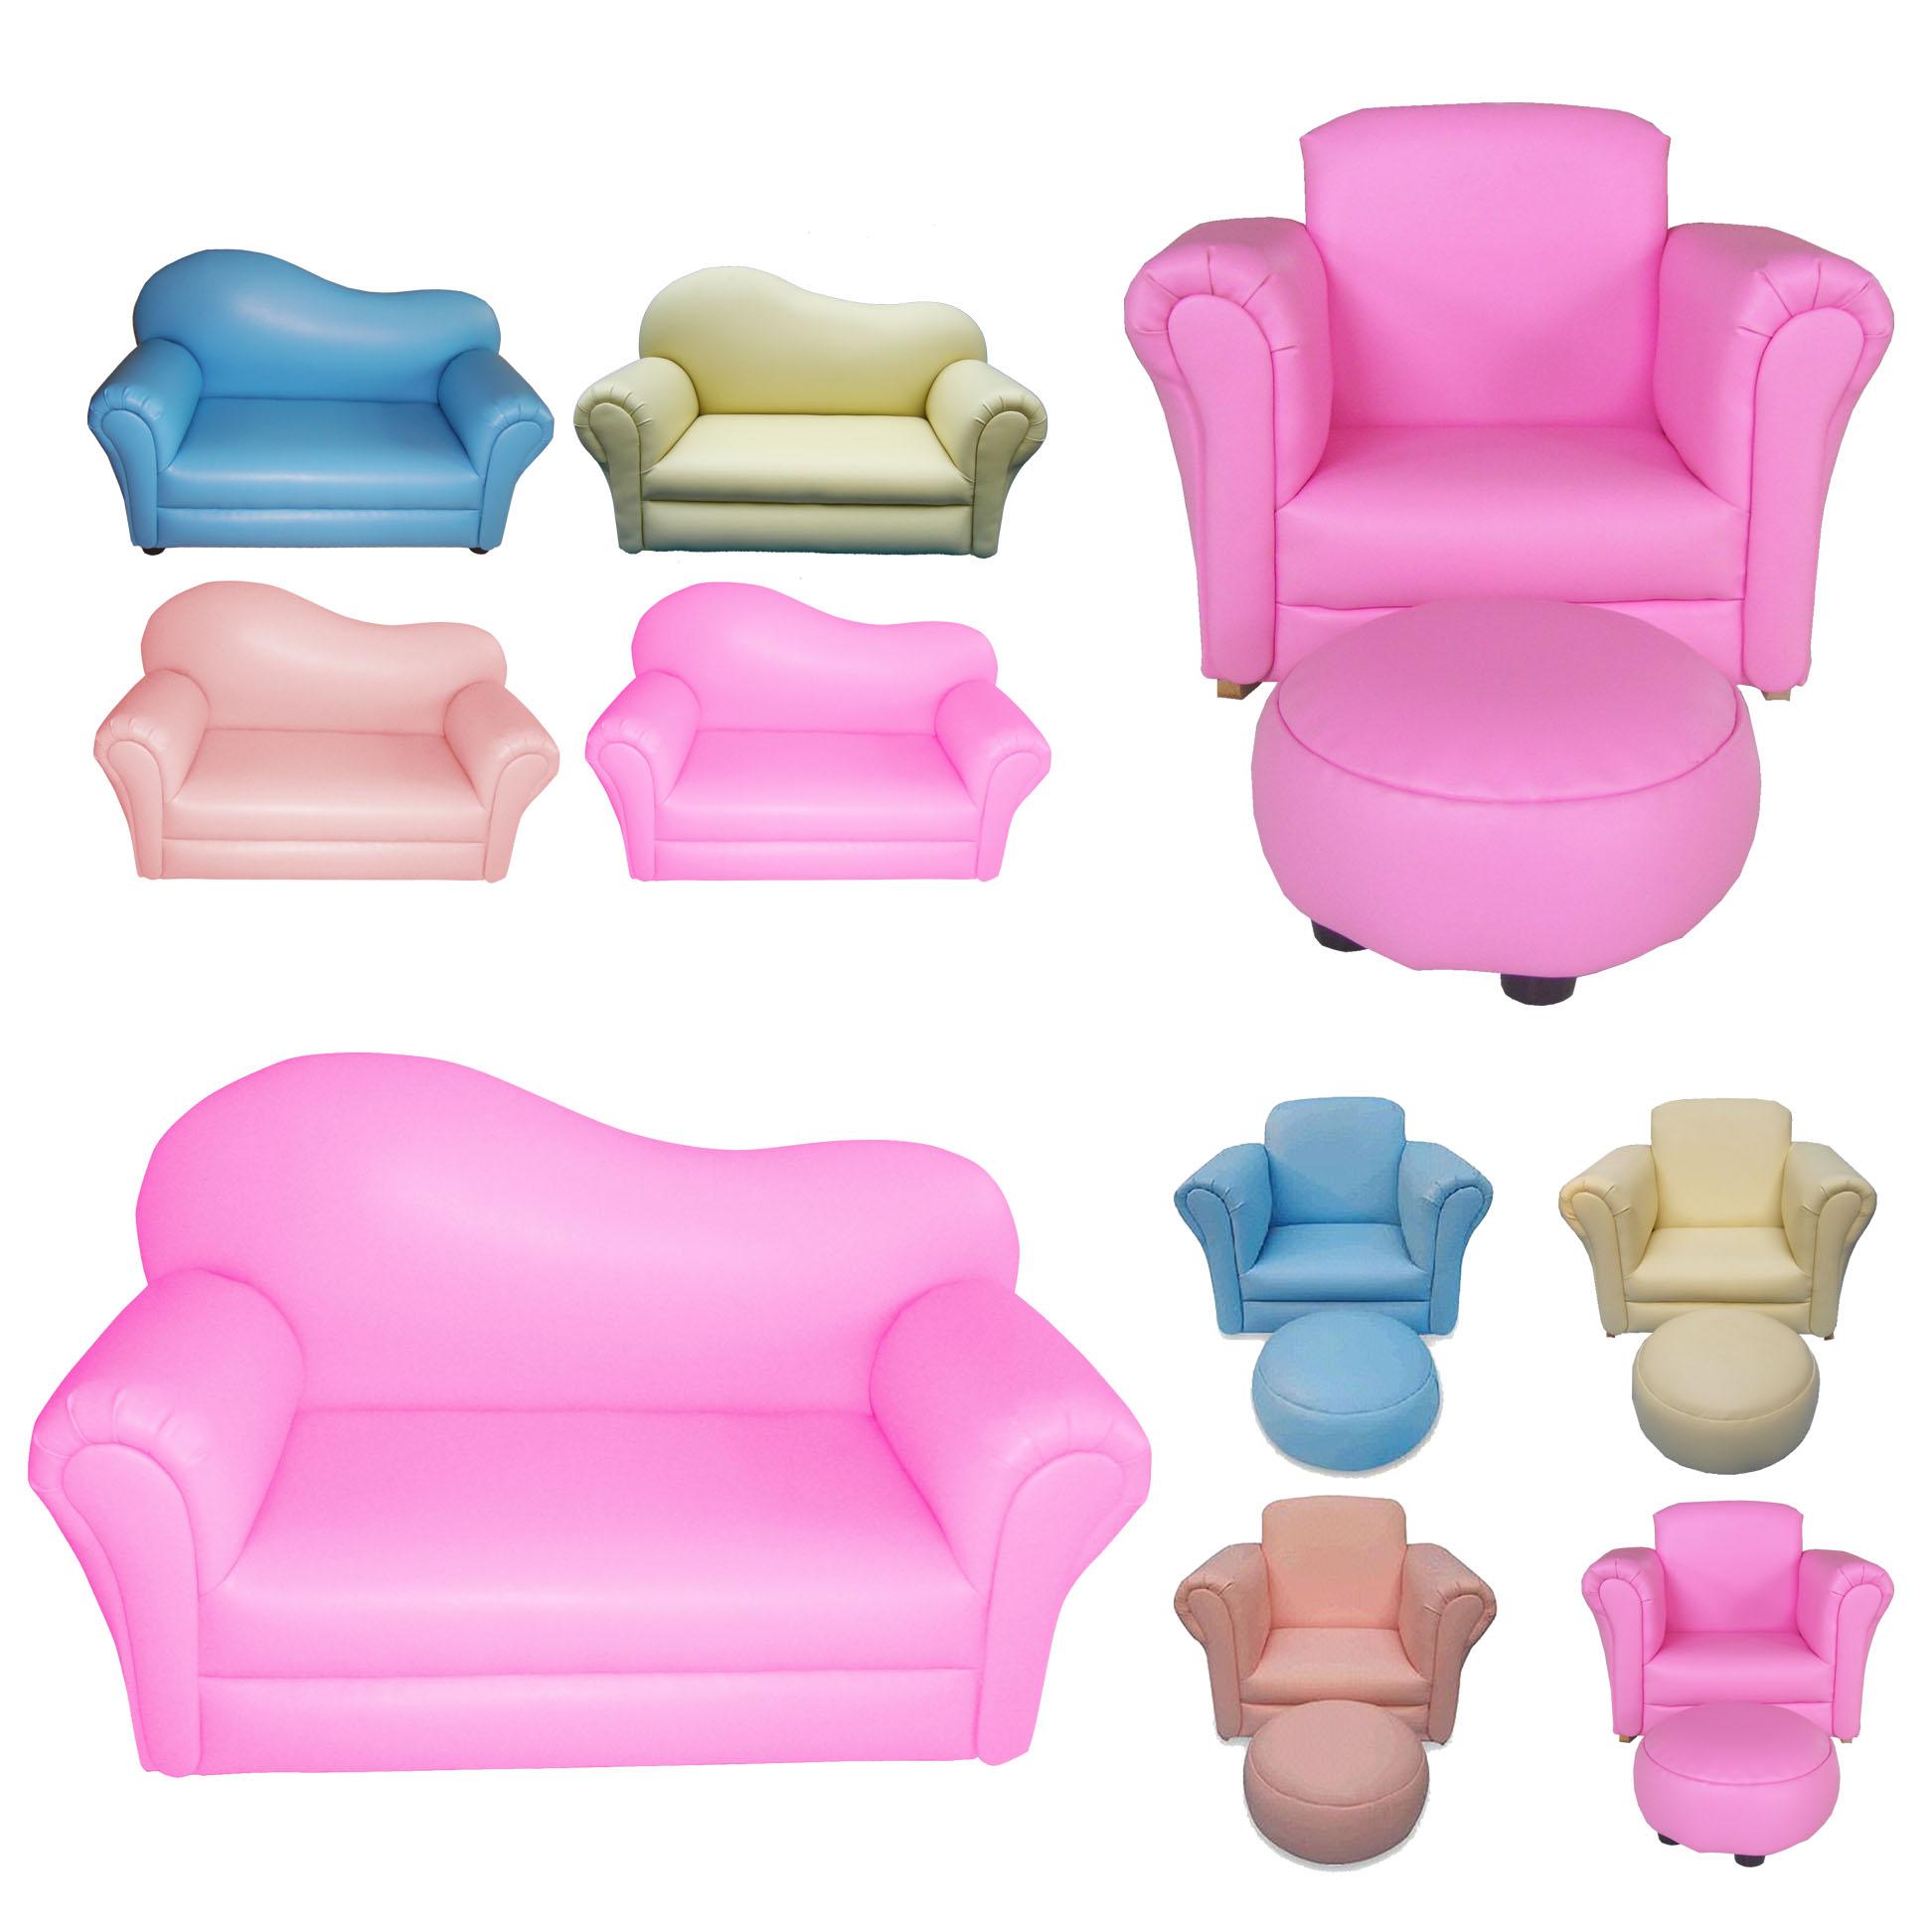 Children Kids Child Sofa Furniture Armchair Couch Seat On